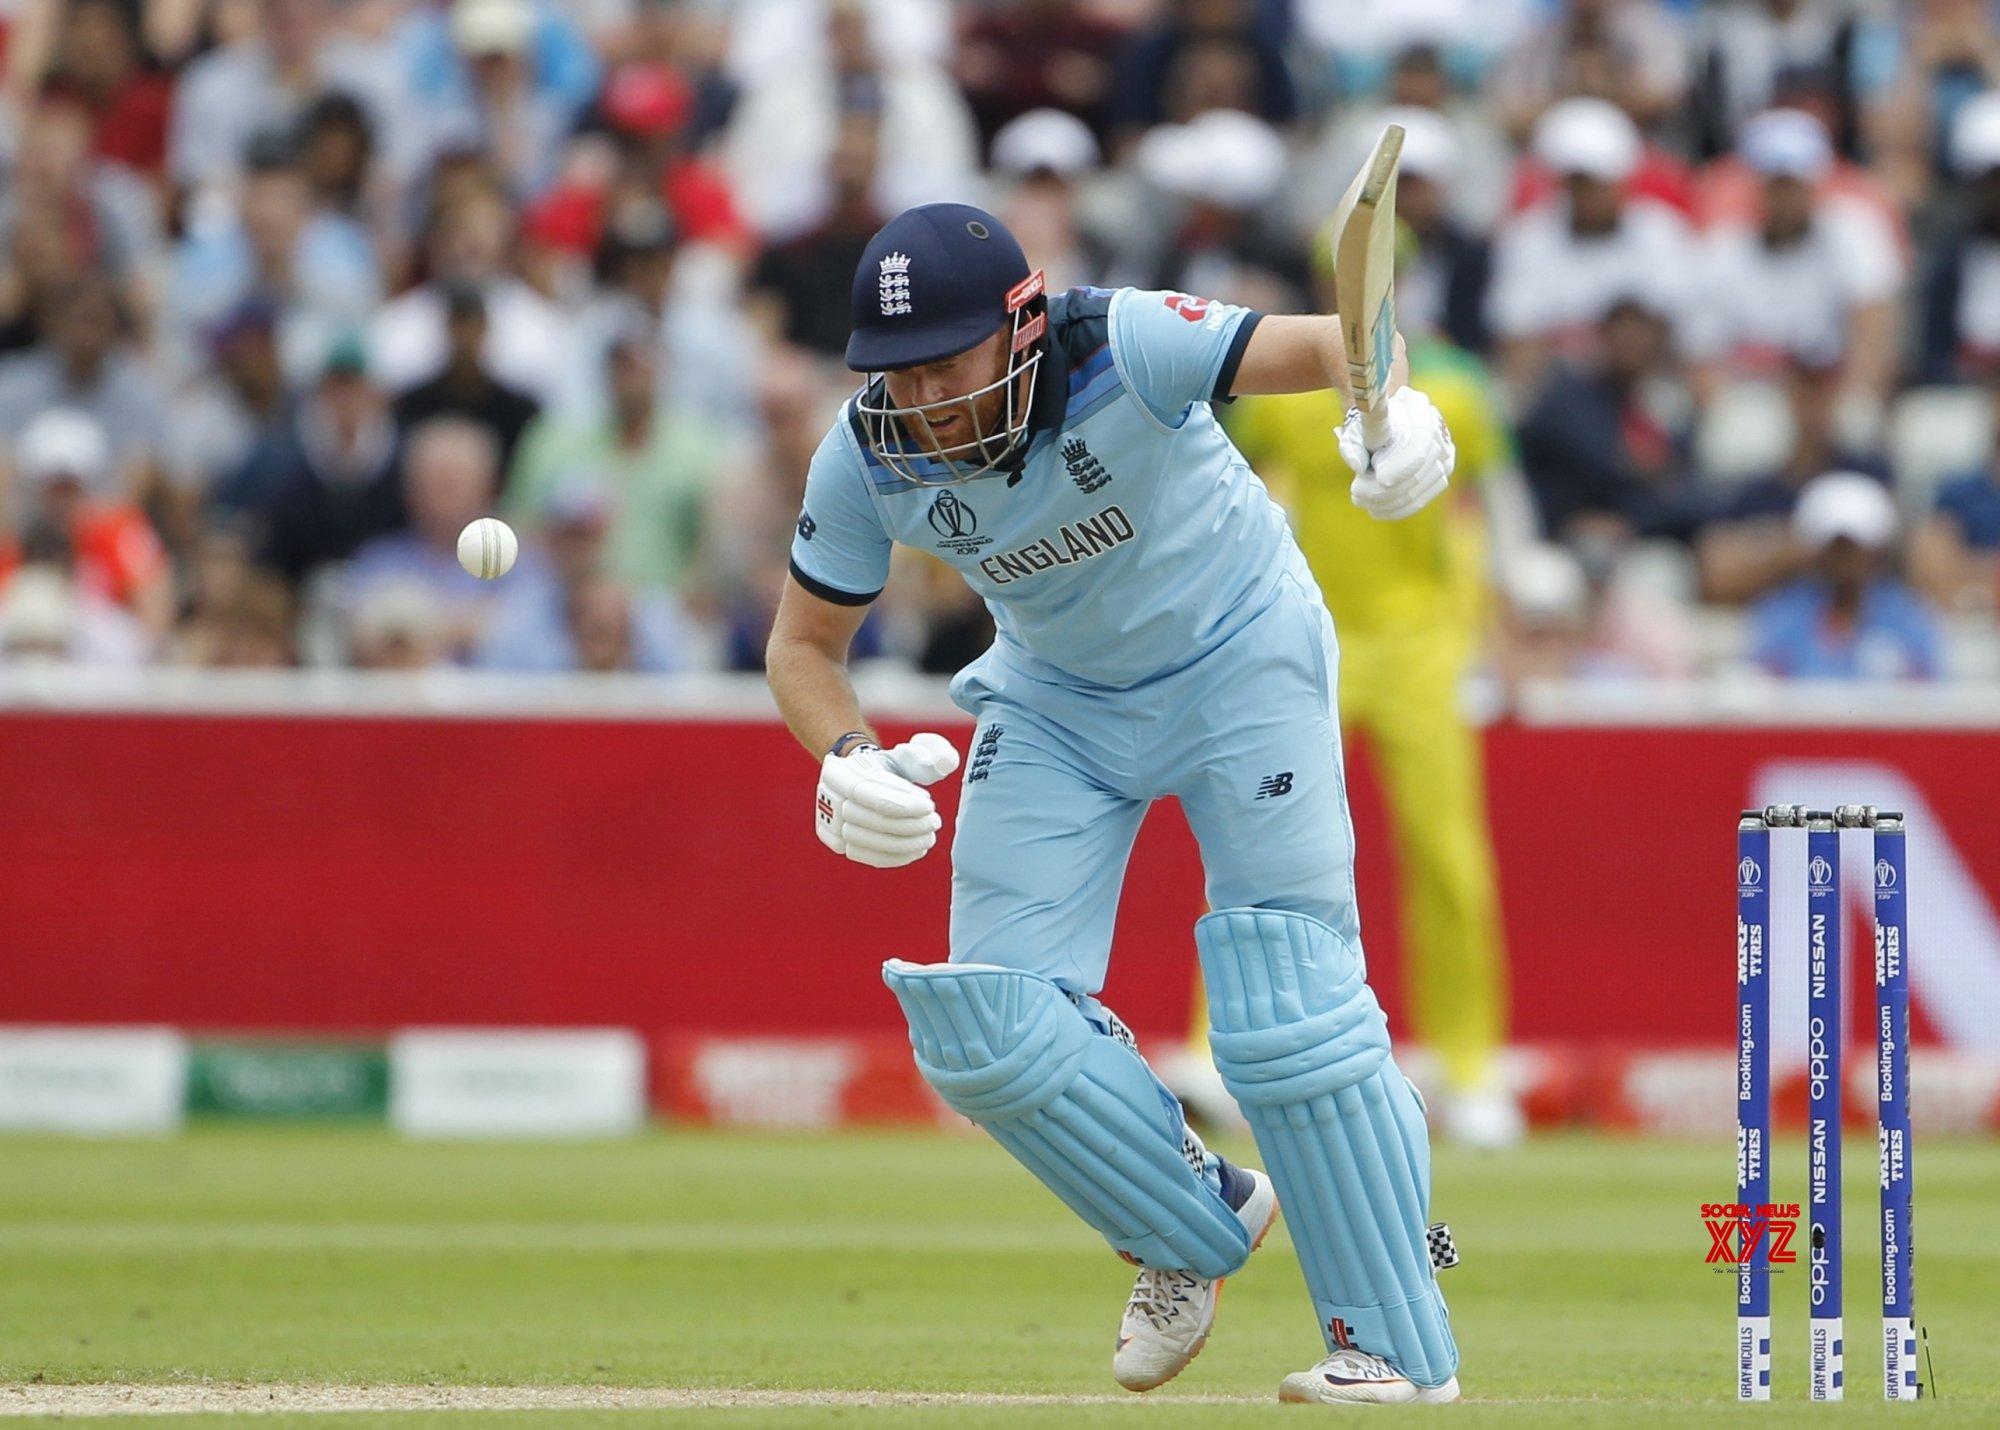 Birmingham (England): 2019 World Cup - 2nd Semi - final - Australia Vs England (Batch - 36) #Gallery